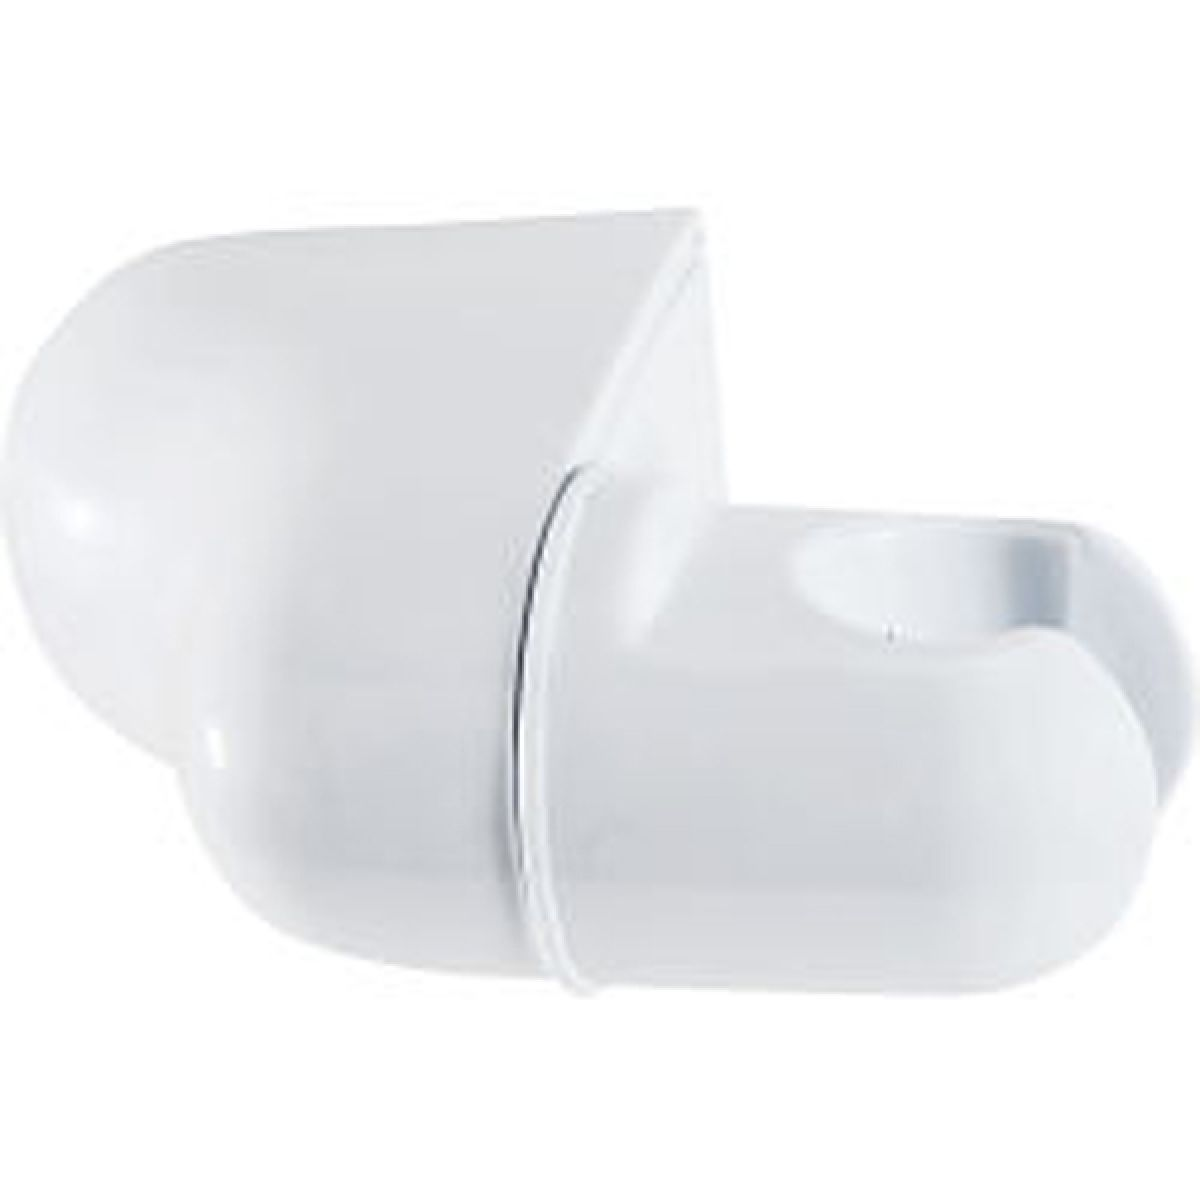 Croydex Adjustable Shower Wall Bracket White